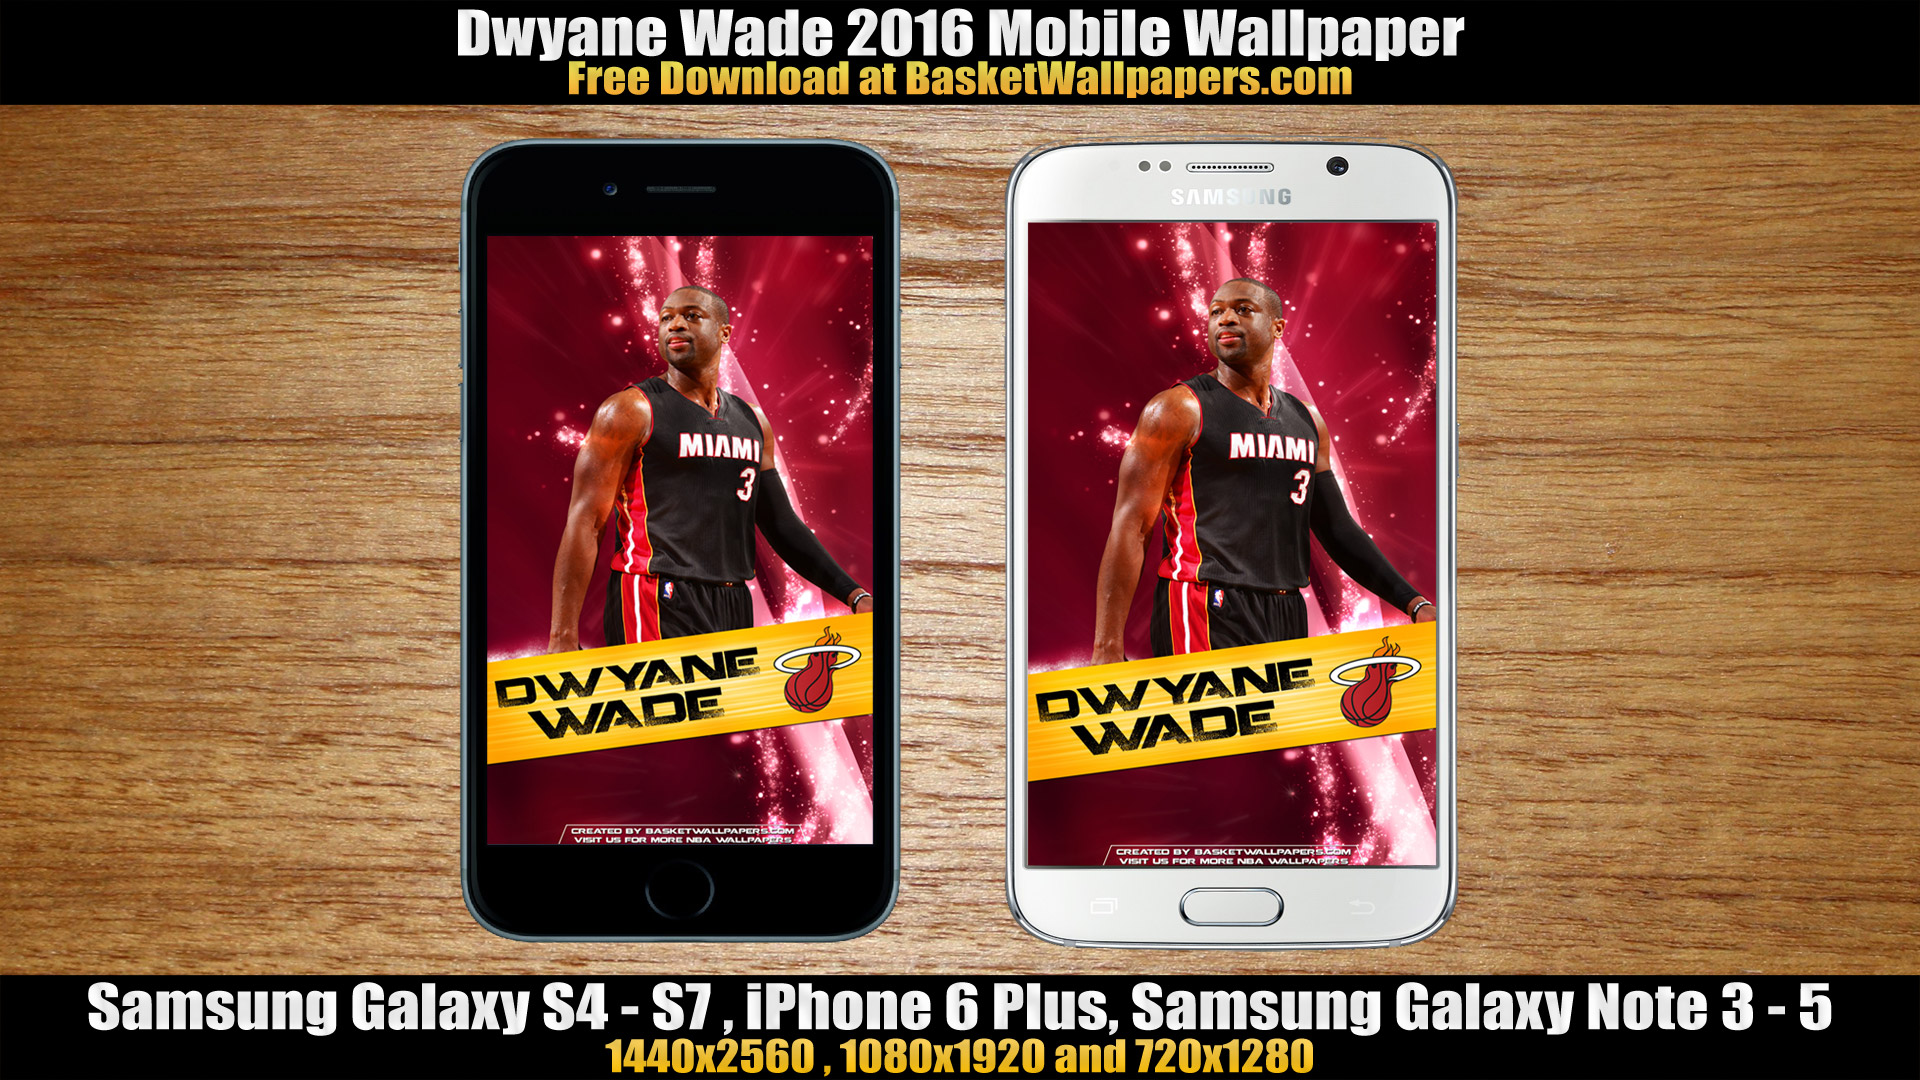 Dwyane Wade Miami Heat 2016 Mobile Wallpaper Basketball Wallpapers 1920x1080